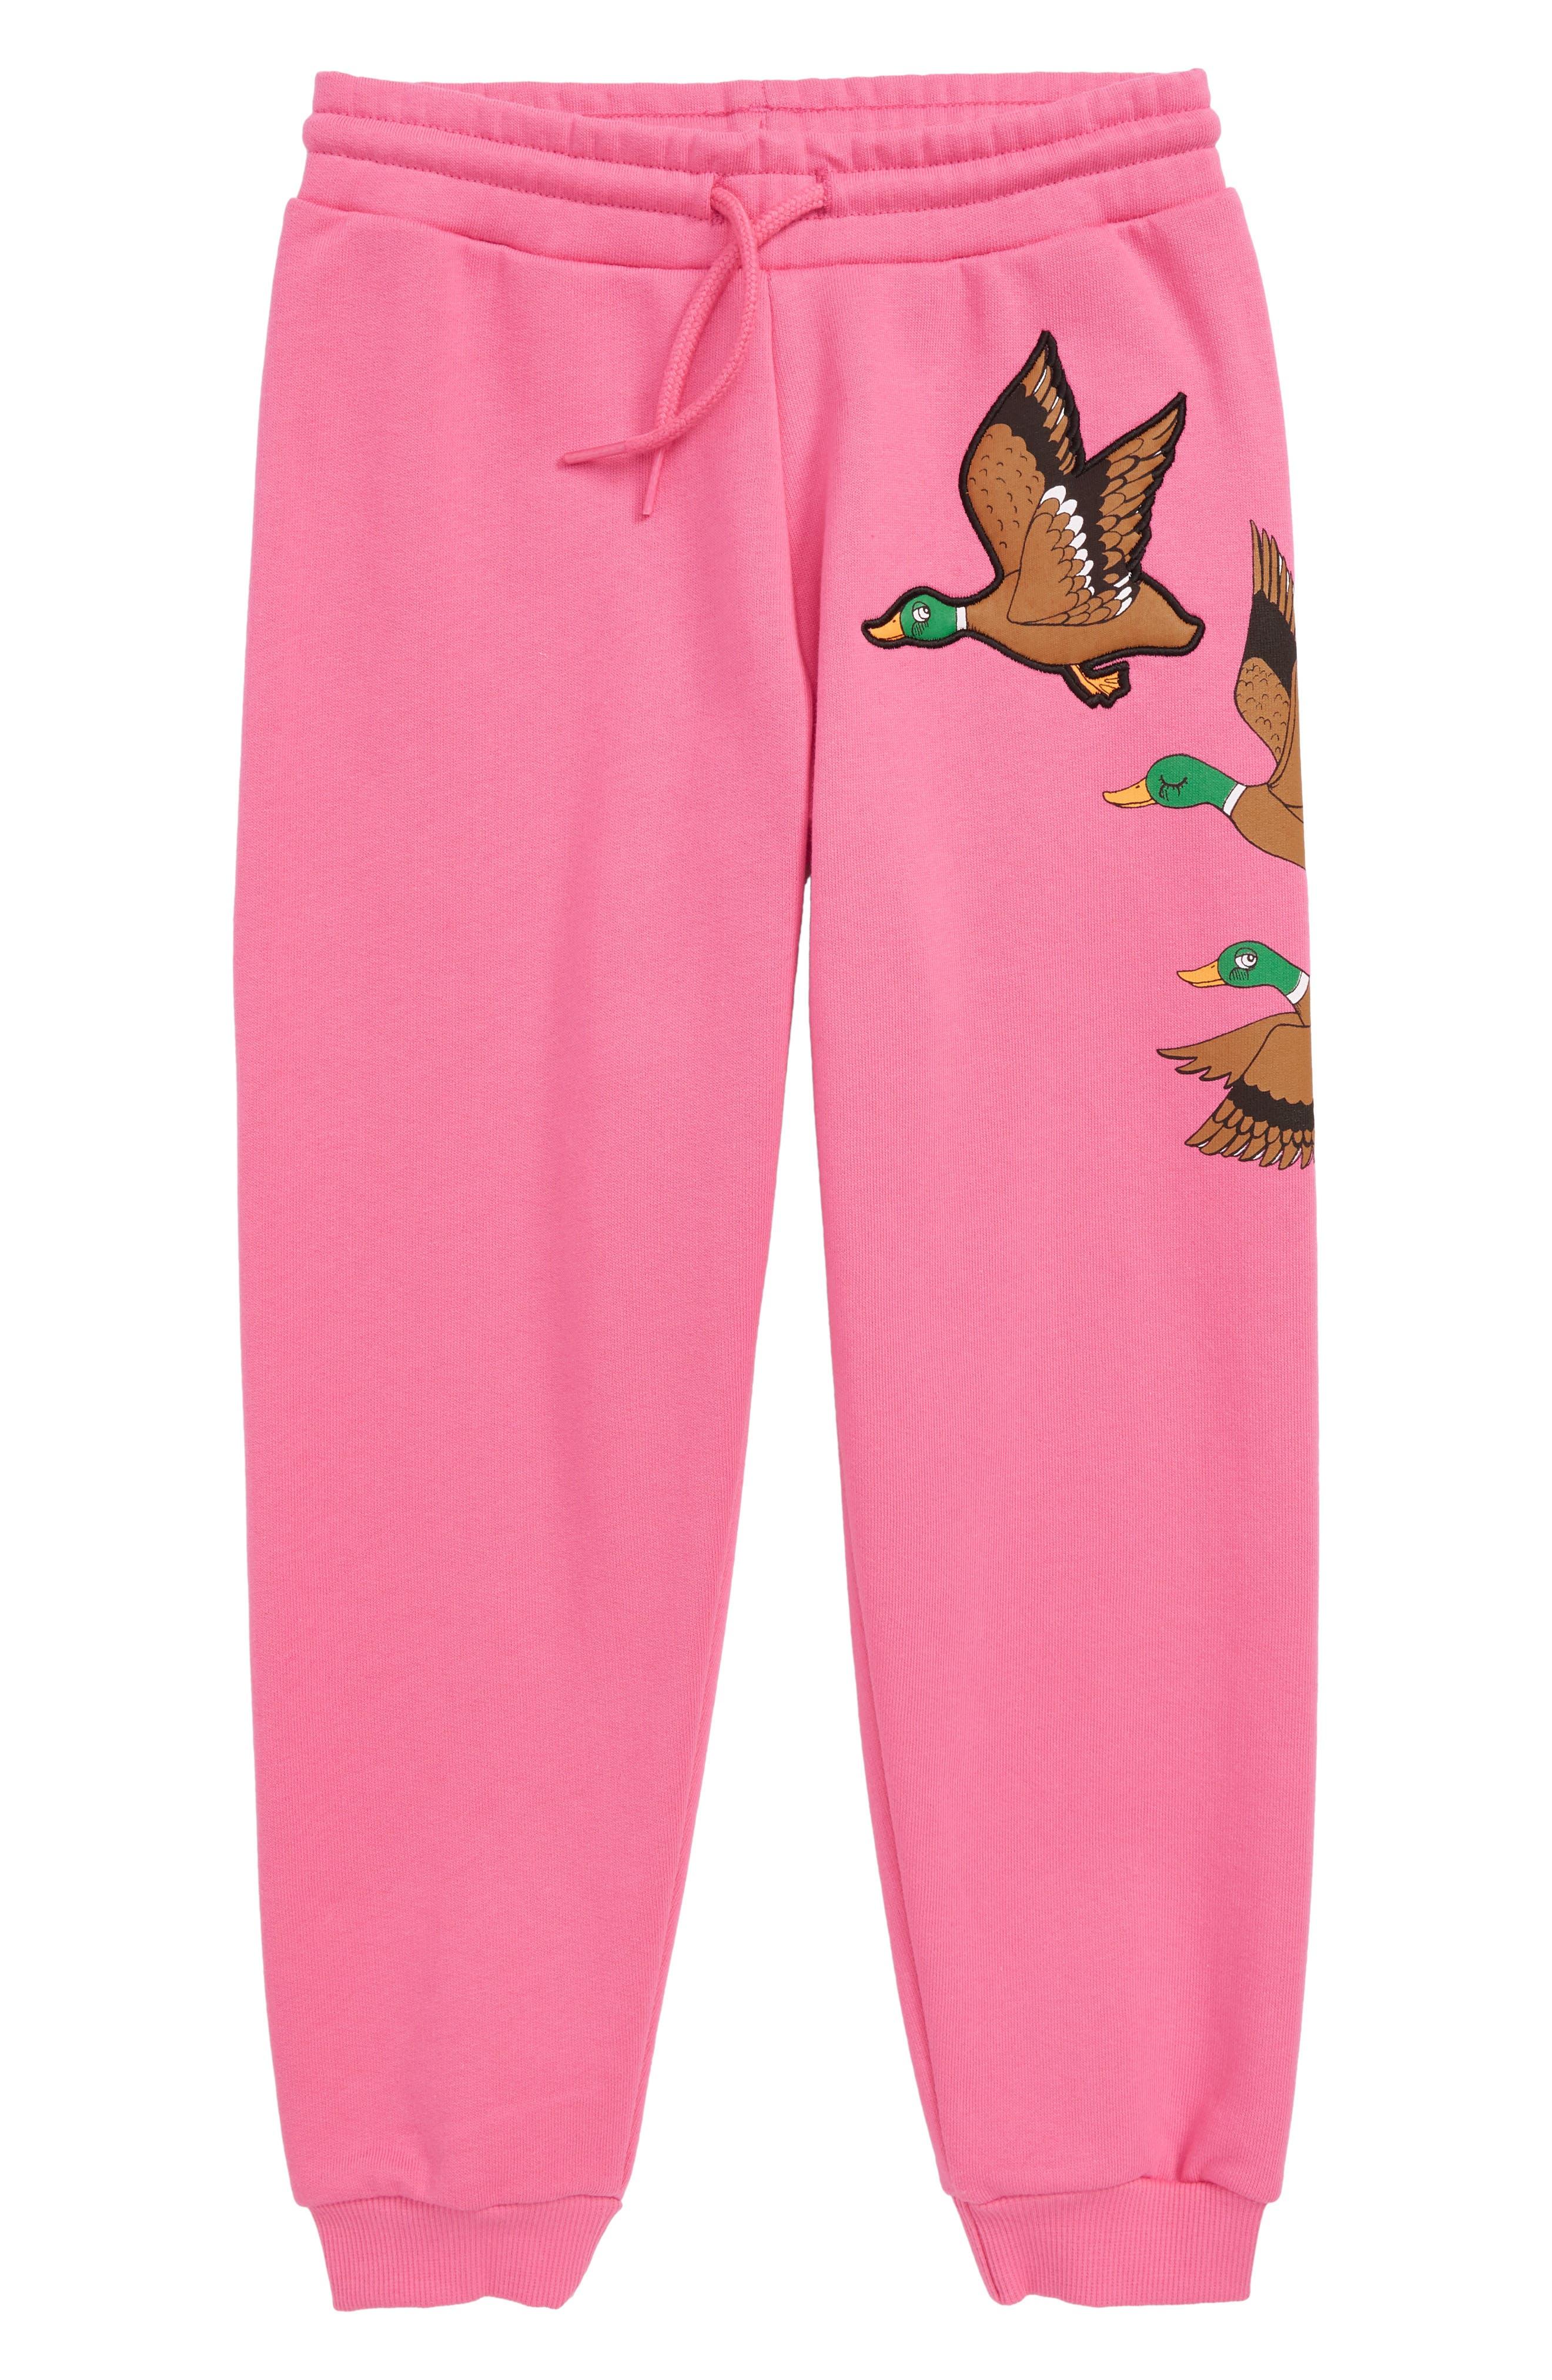 Ducks Organic Cotton Sweatpants,                             Main thumbnail 1, color,                             CERISE